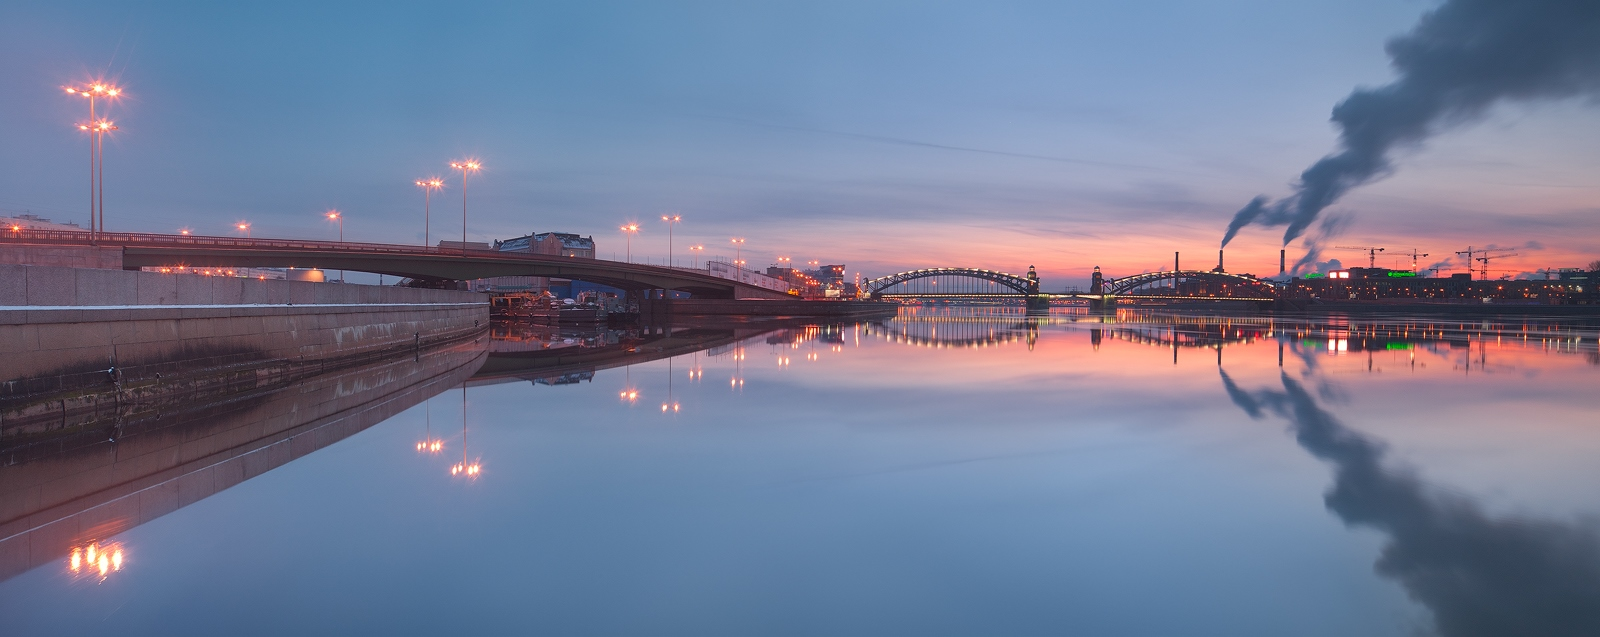 Night Saint Petersburg: Amazing photos of the city by Sergey Louks - 17